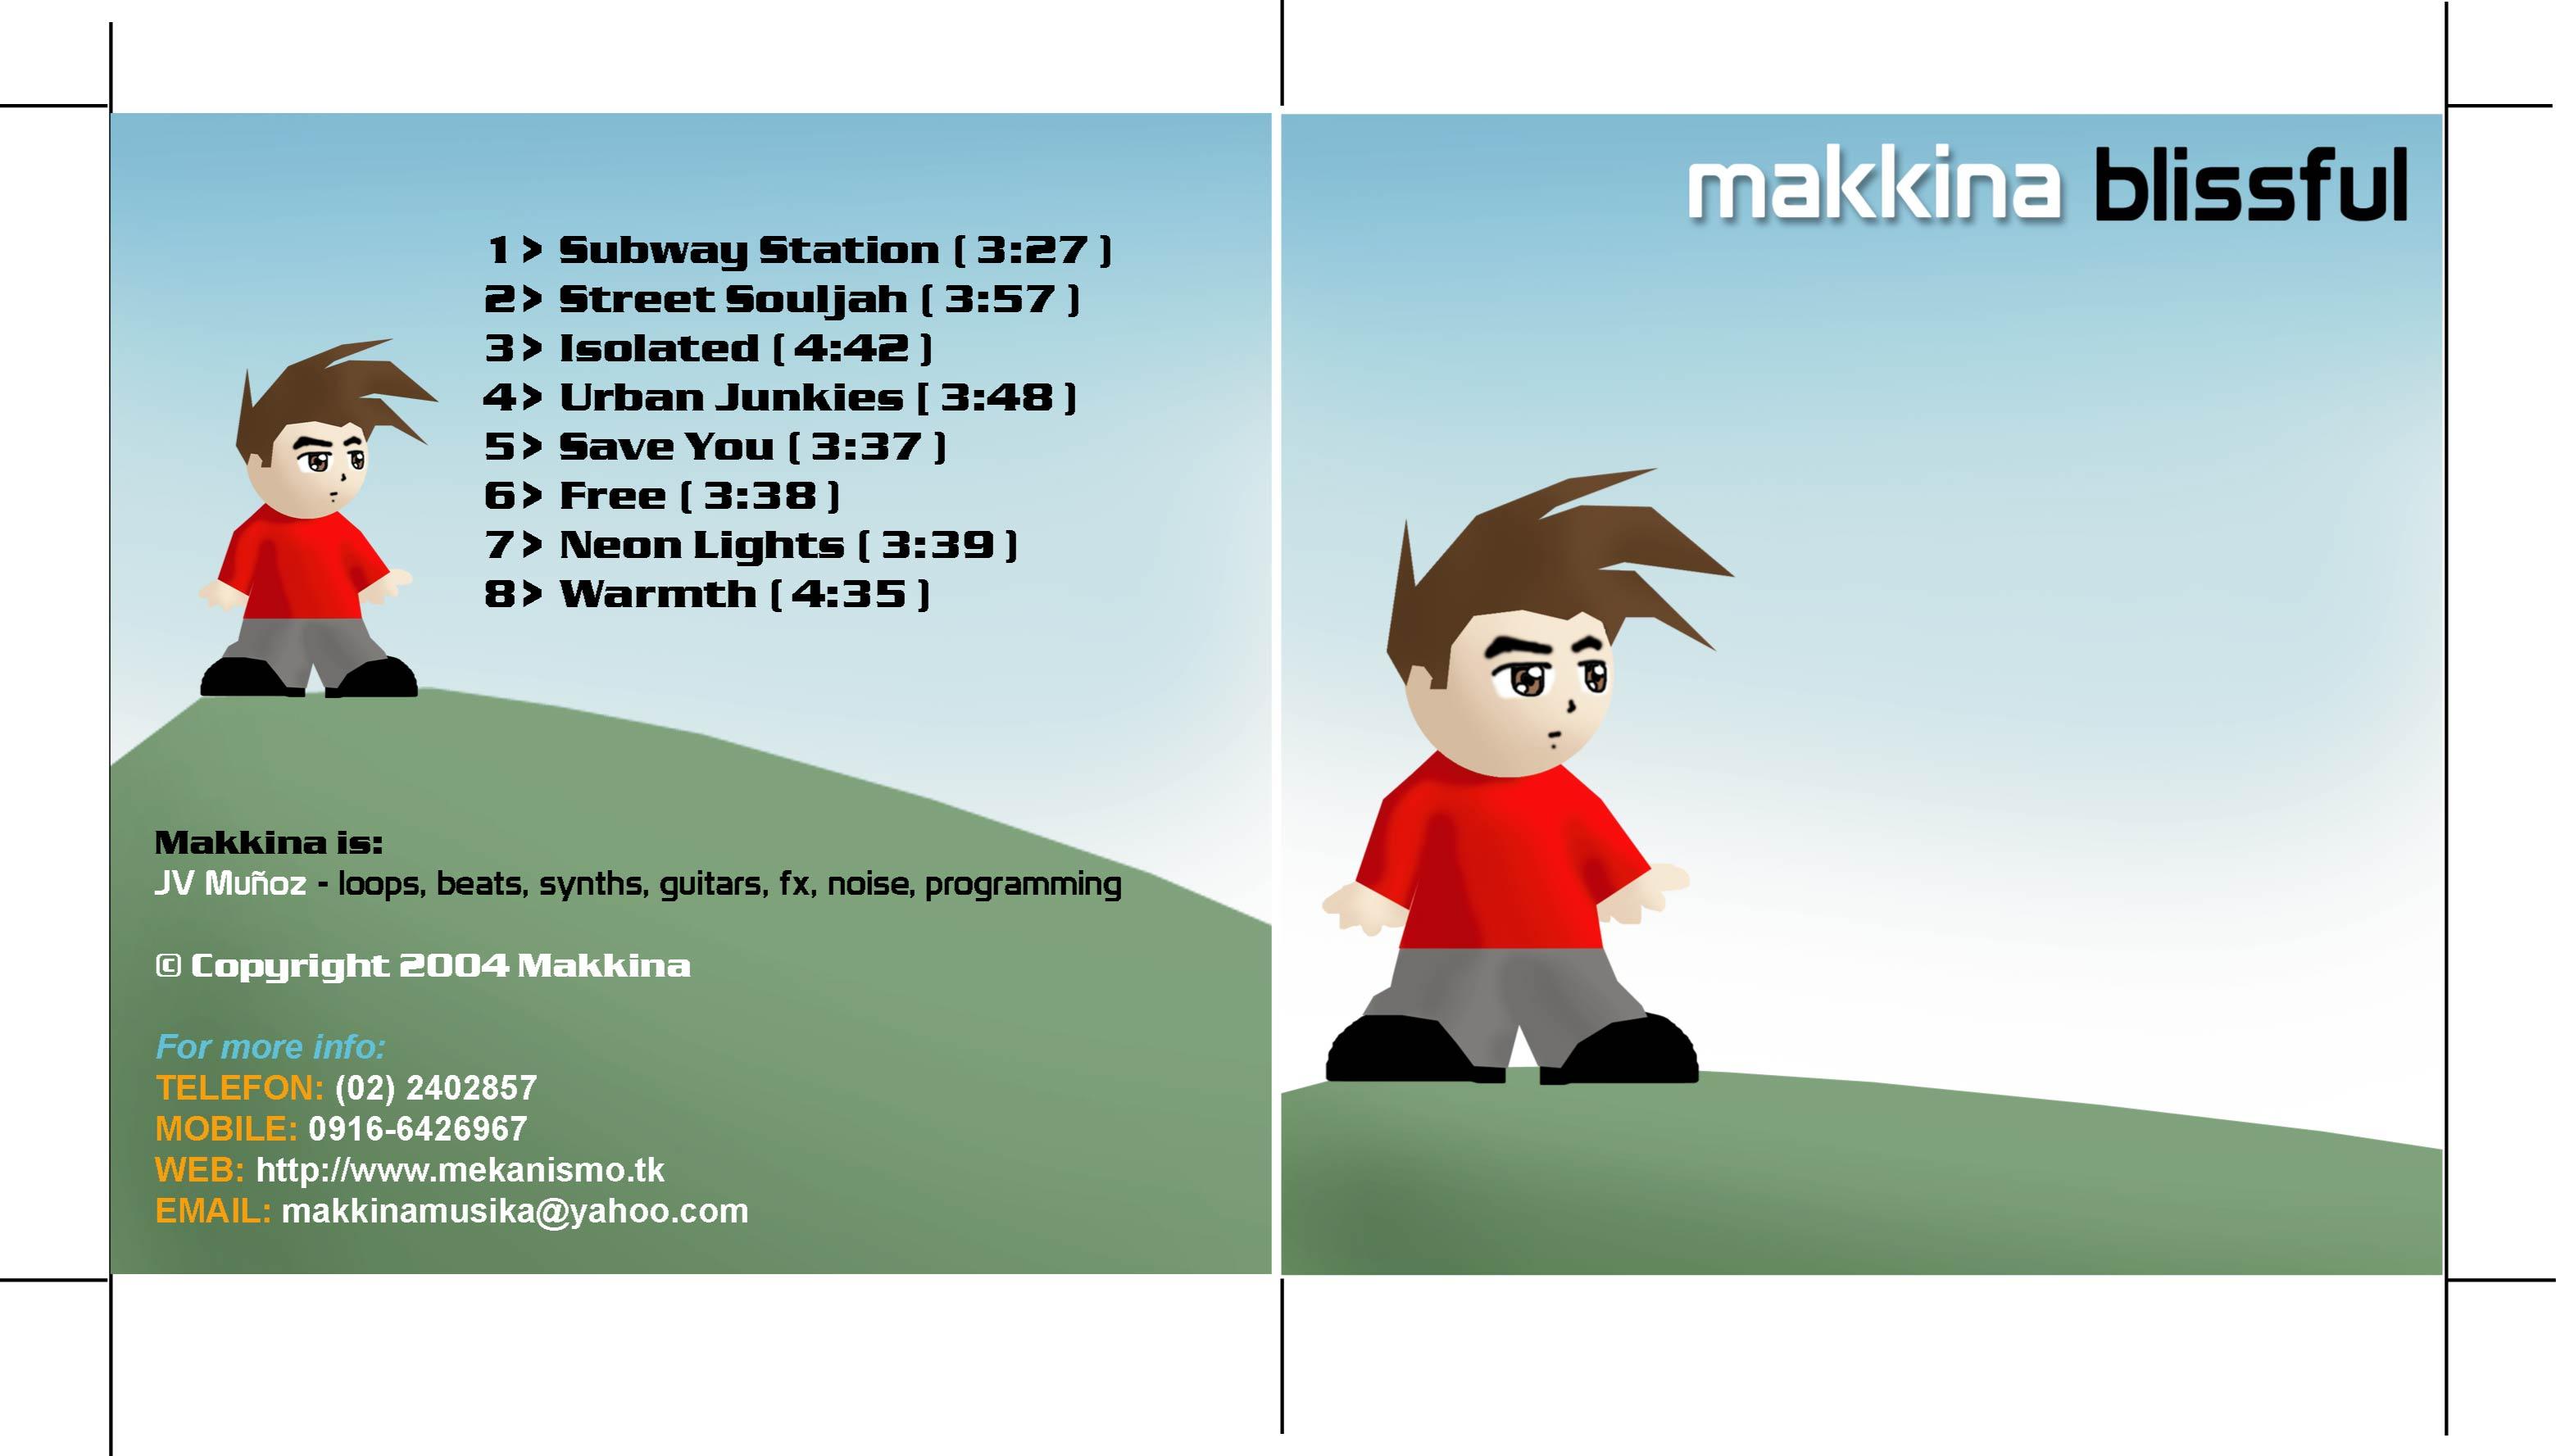 (qd-4214) Makkina - Blissful